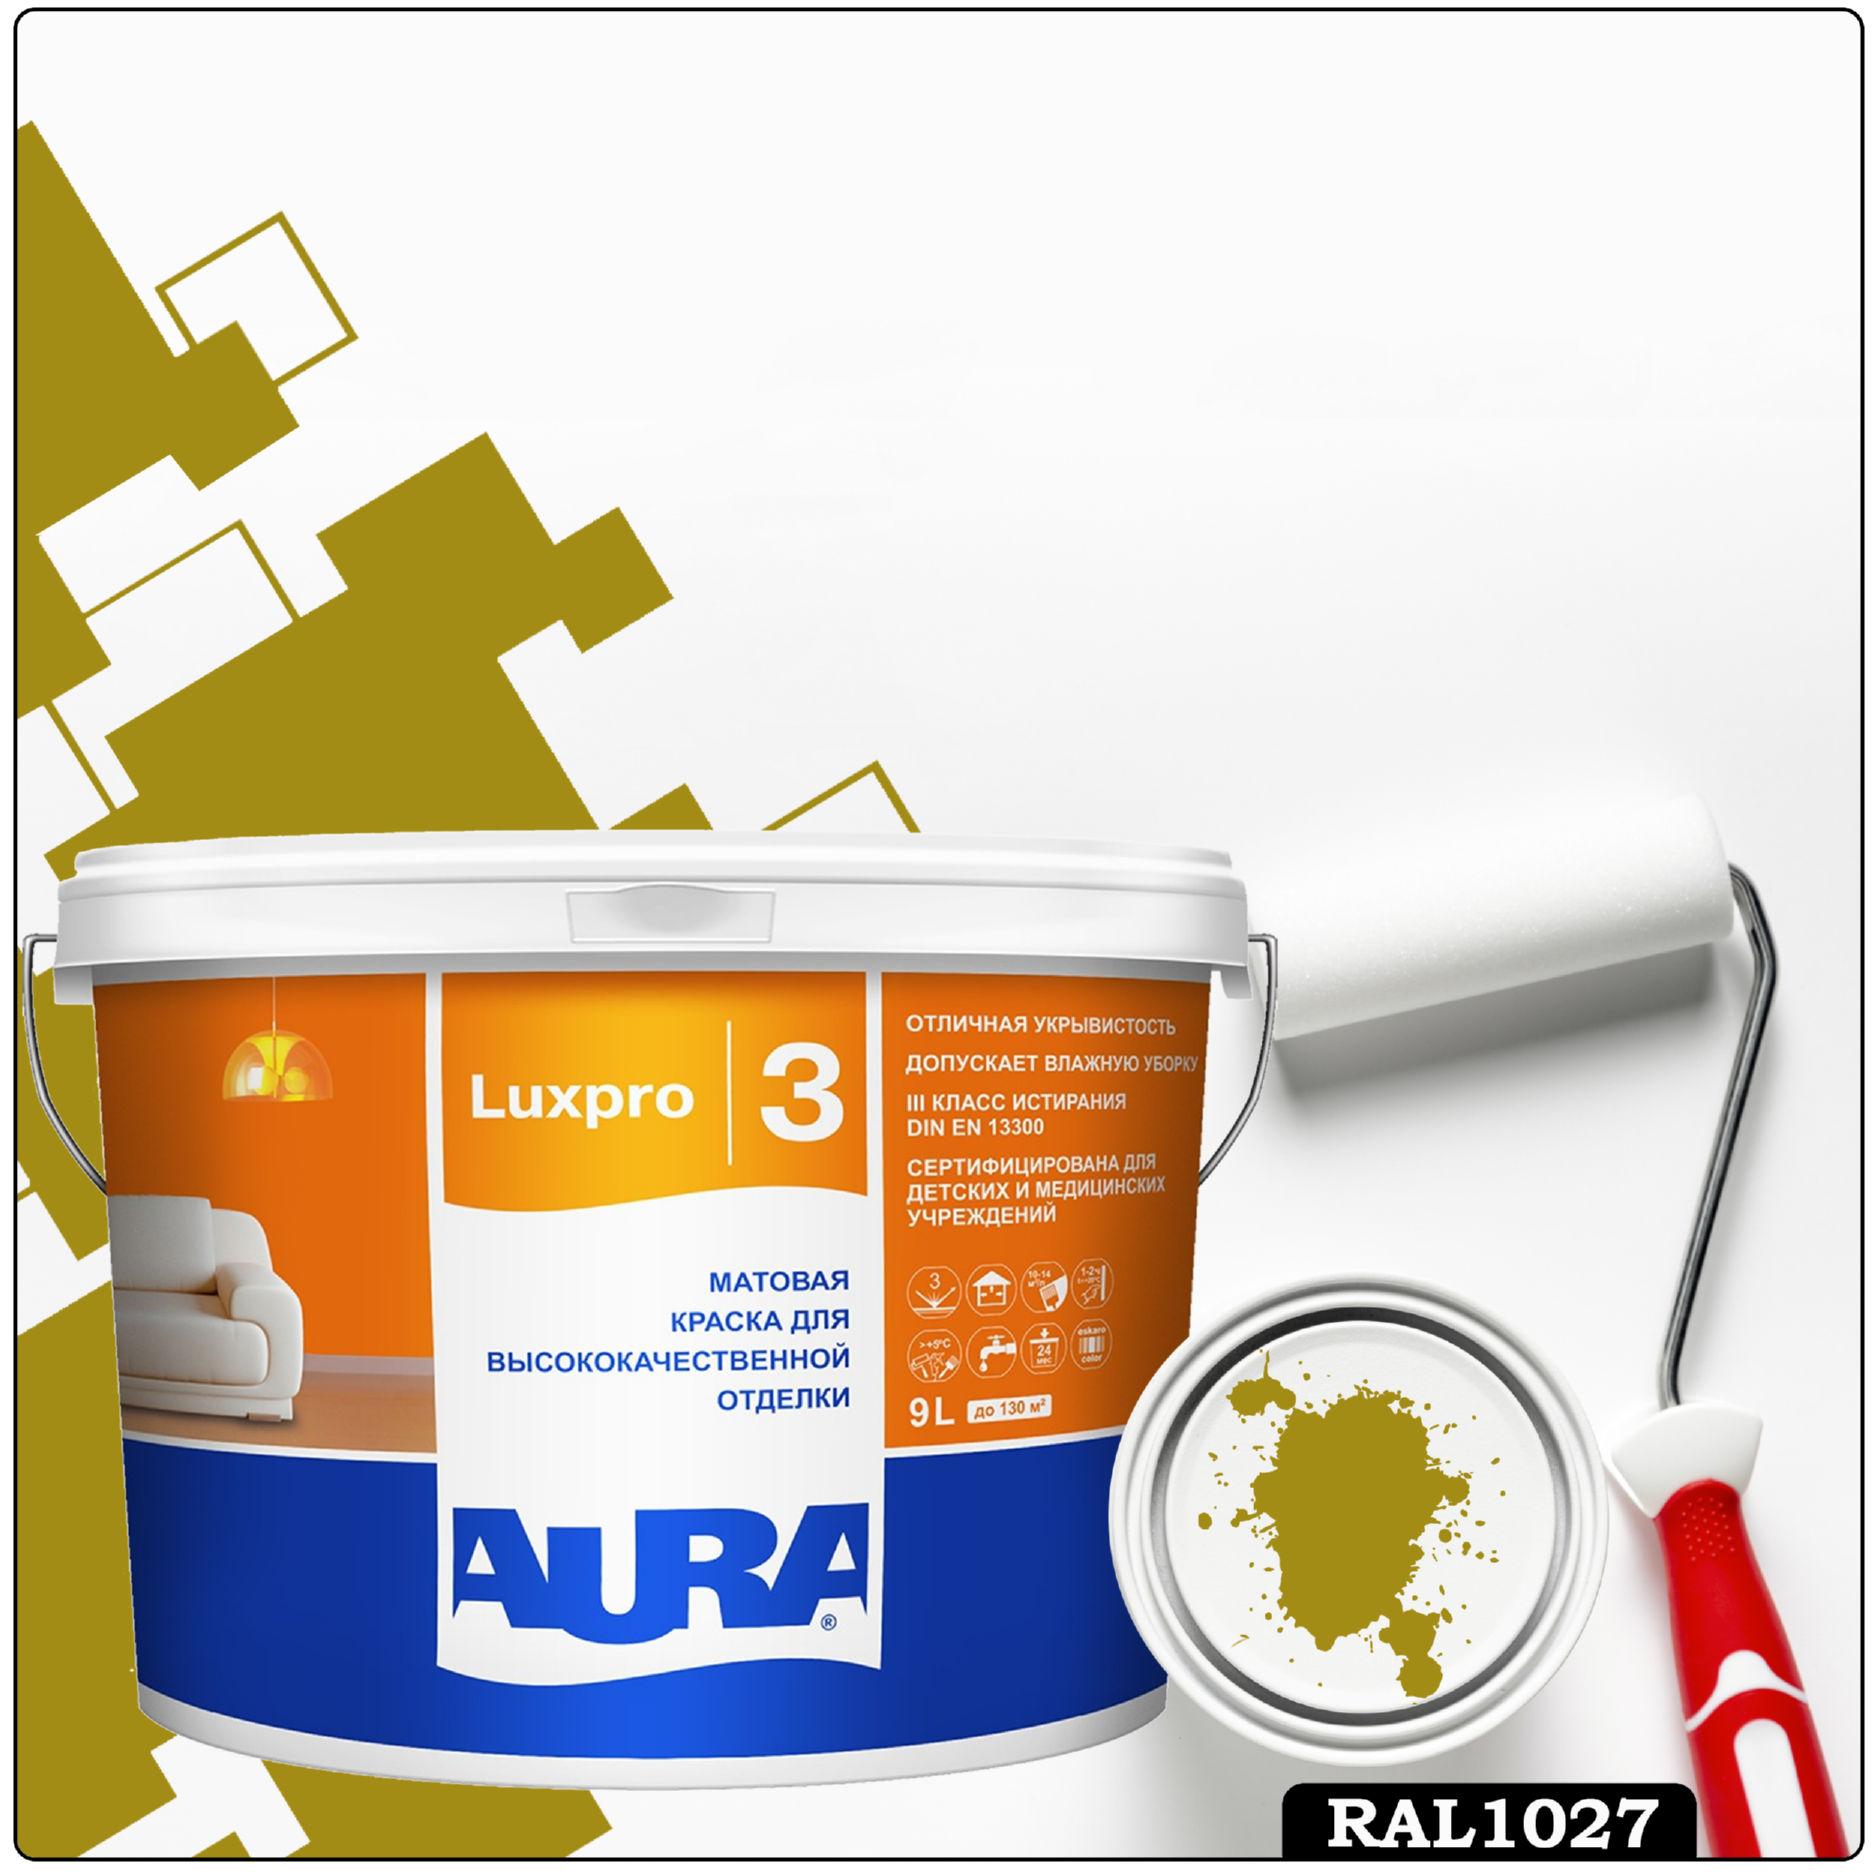 Фото 22 - Краска Aura LuxPRO 3, RAL 1027 Карри жёлтый, латексная, шелково-матовая, интерьерная, 9л, Аура.